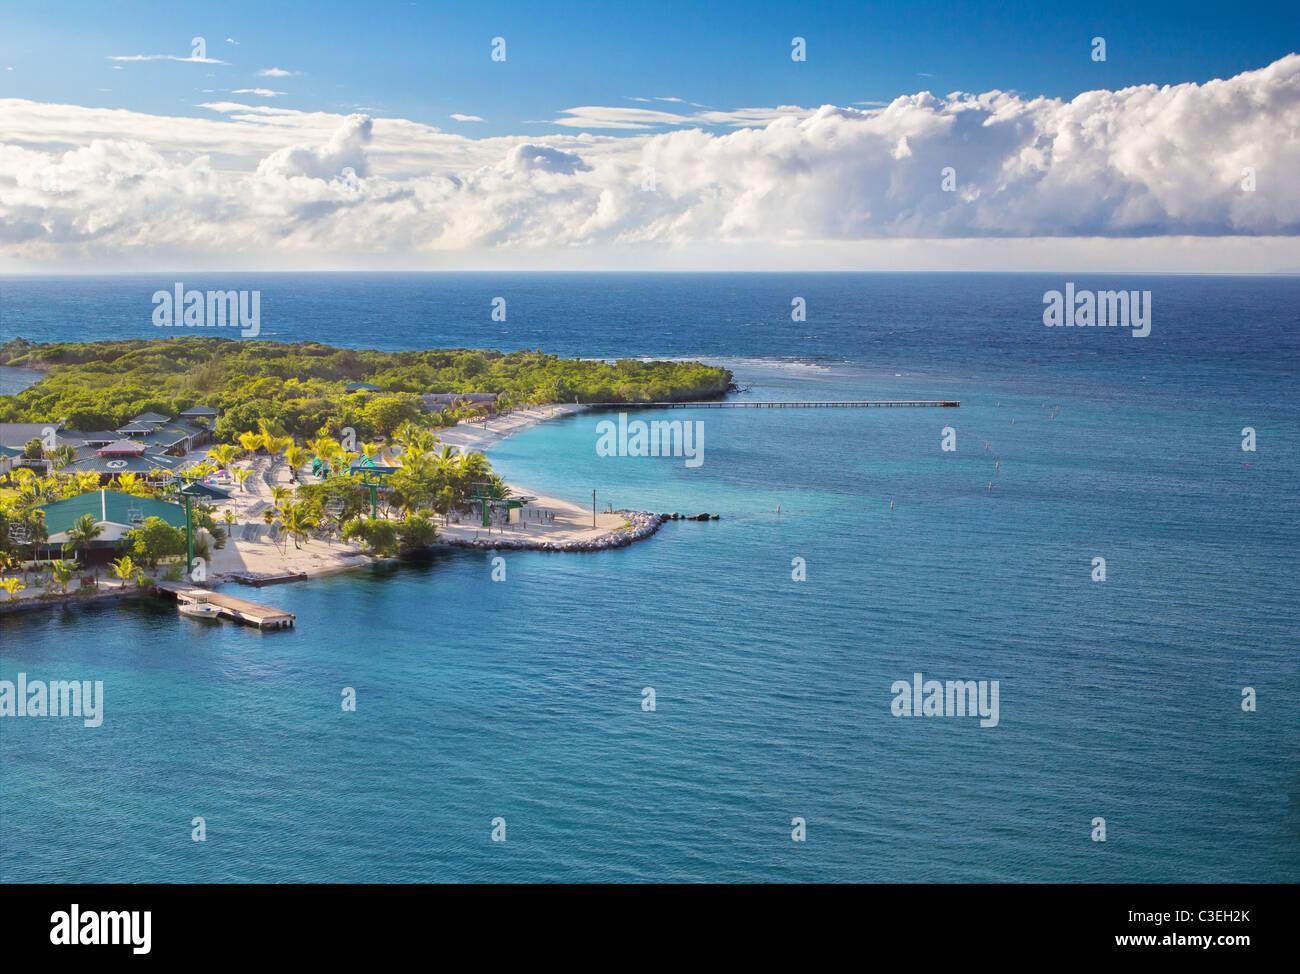 Photograph of the coast of Honduras island Roatan - Stock Image